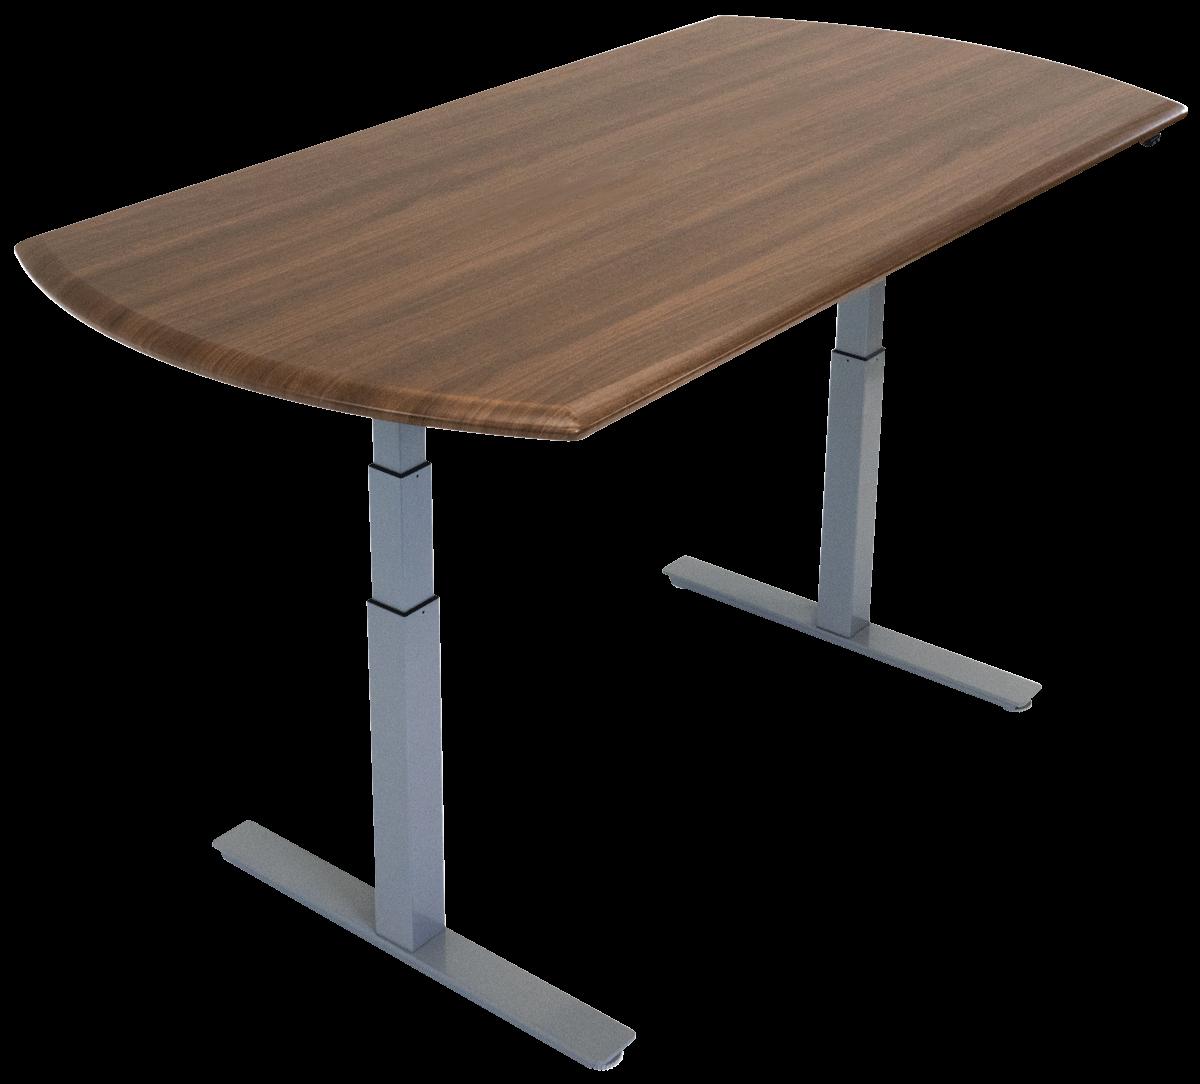 iMovR Synapse Adjustable-Height Multi-Purpose Table - Convex